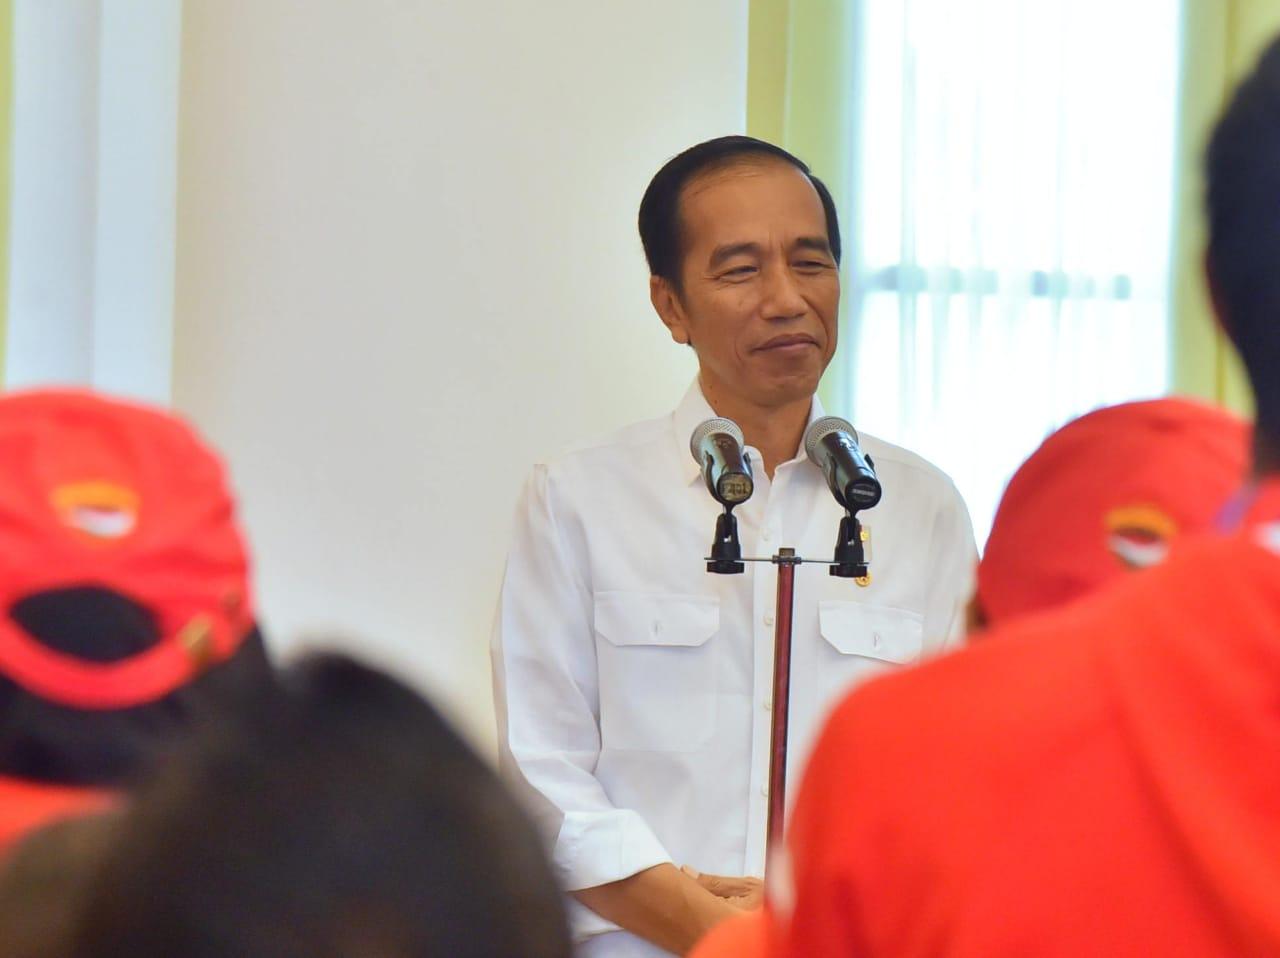 Presiden Jokowi Jelaskan Alasan Kenapa Membatalkan Rencana Kenaikan Harga BBM Jenis Premium